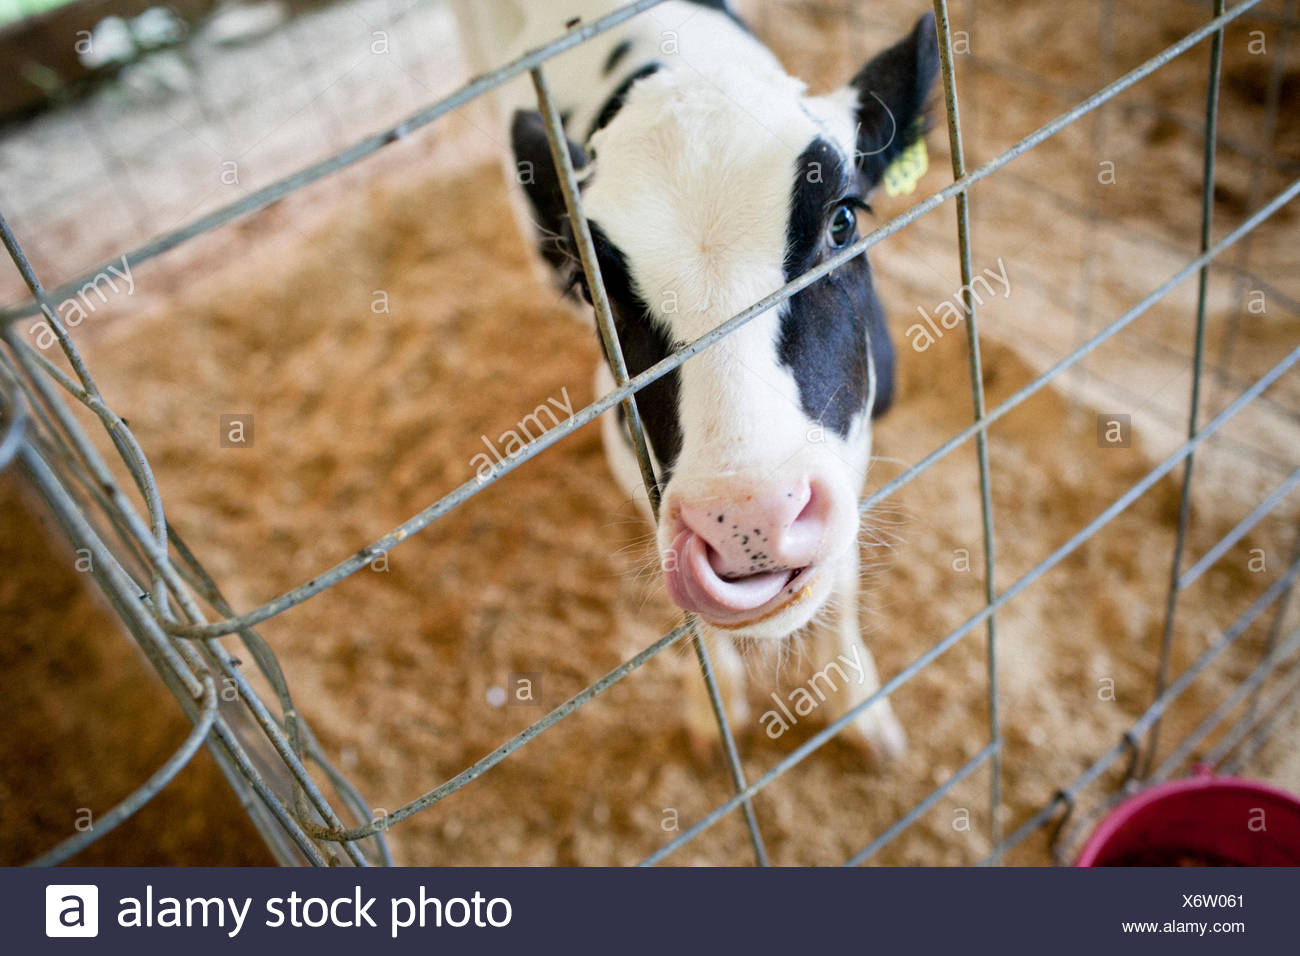 Calf cow licking nose. - Stock Image